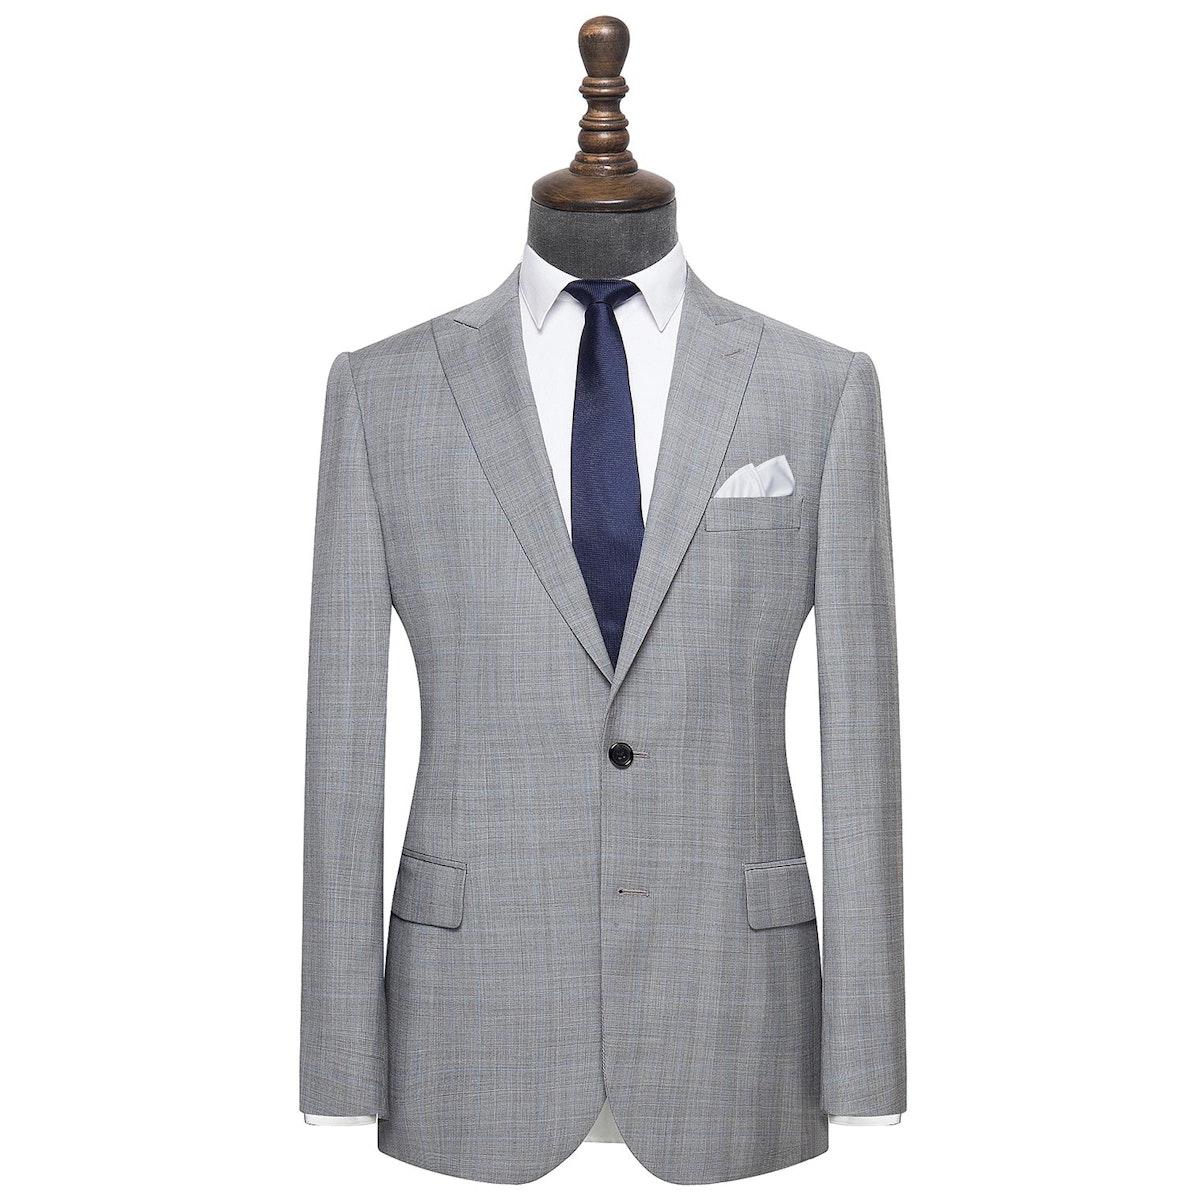 InStitchu Collection The Alfreton mens suit